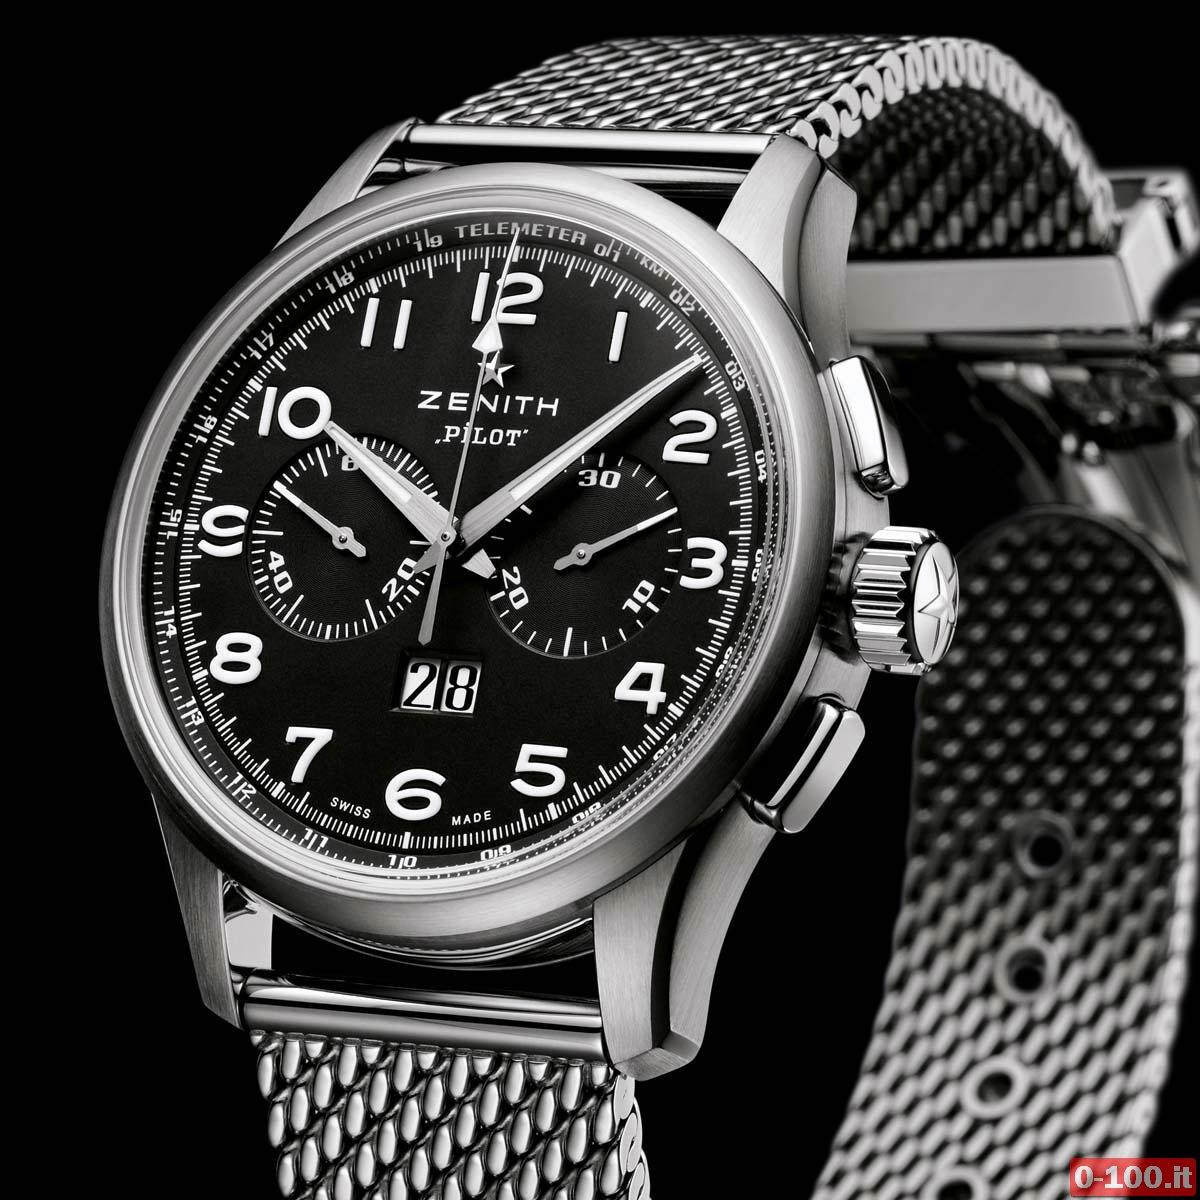 zenith-pilot-big-date-special_0-100_16